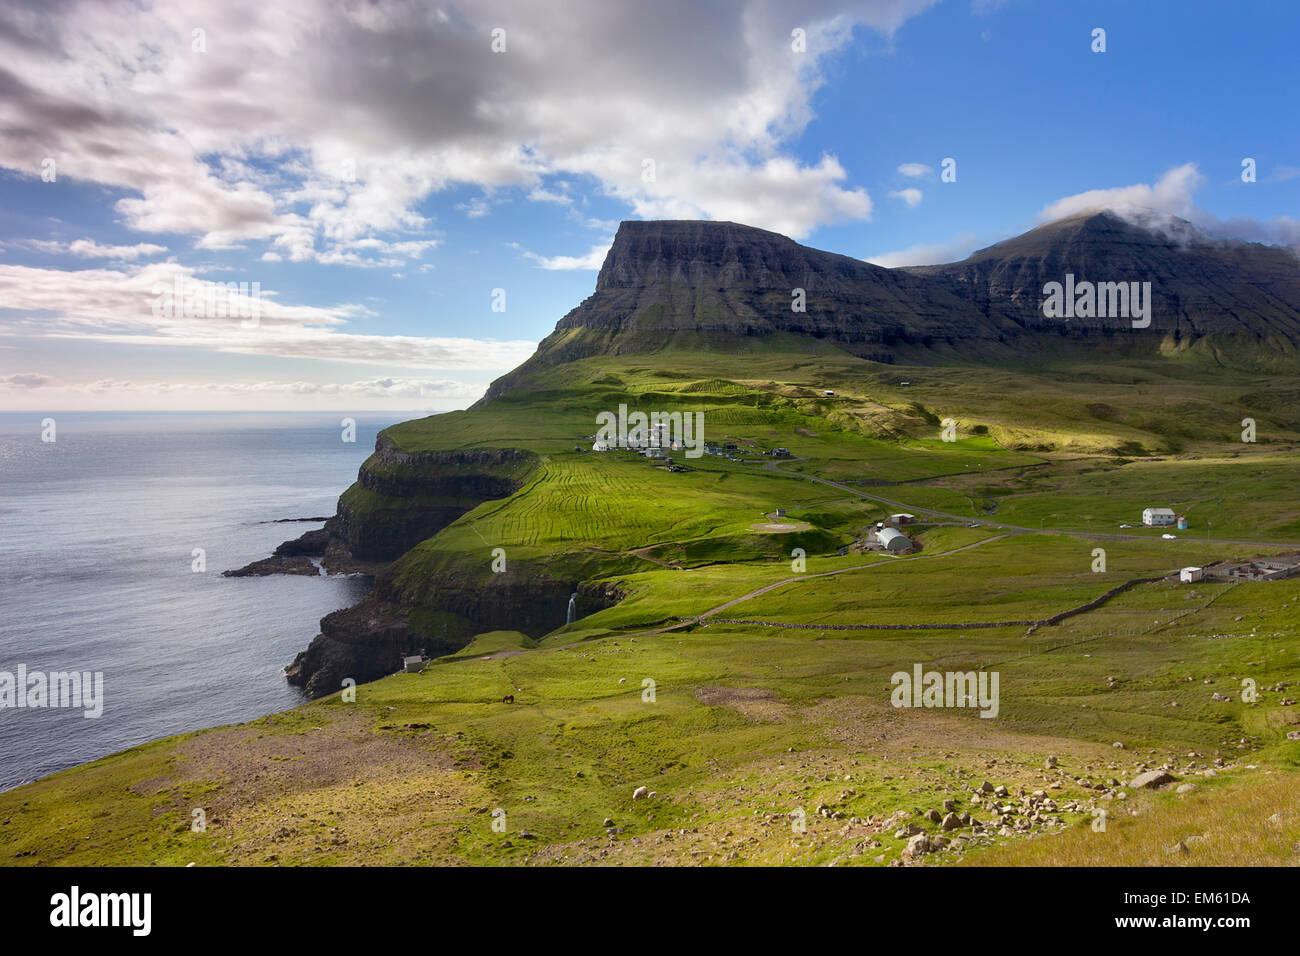 Gasadalur, îles Féroé: splendide paysage naturel Photo Stock